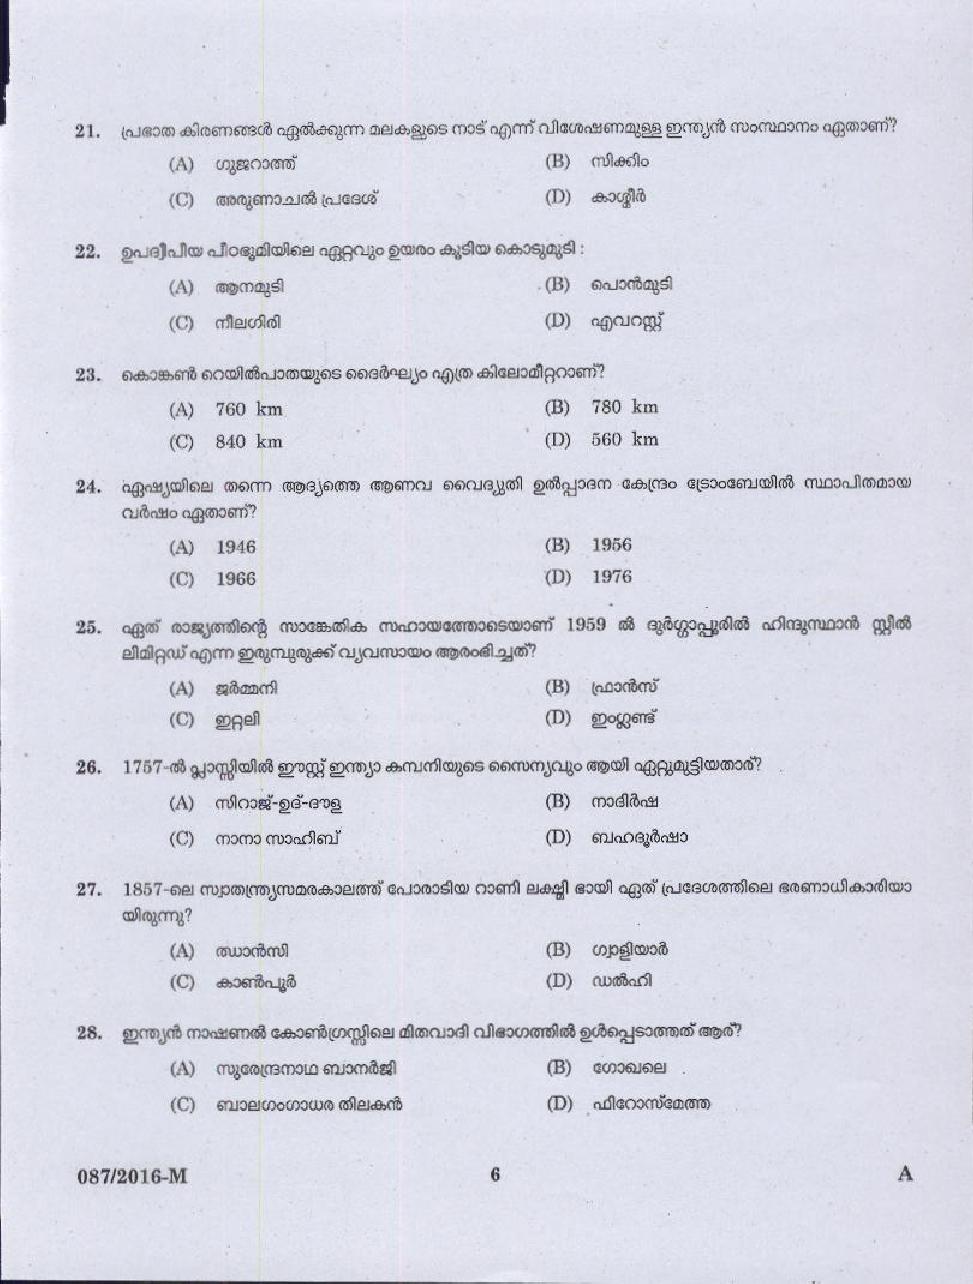 http://masterstudy.net//pdf/psc/village-extension-officer-gr-ii-rural-development/q_0872016-m0004.jpg